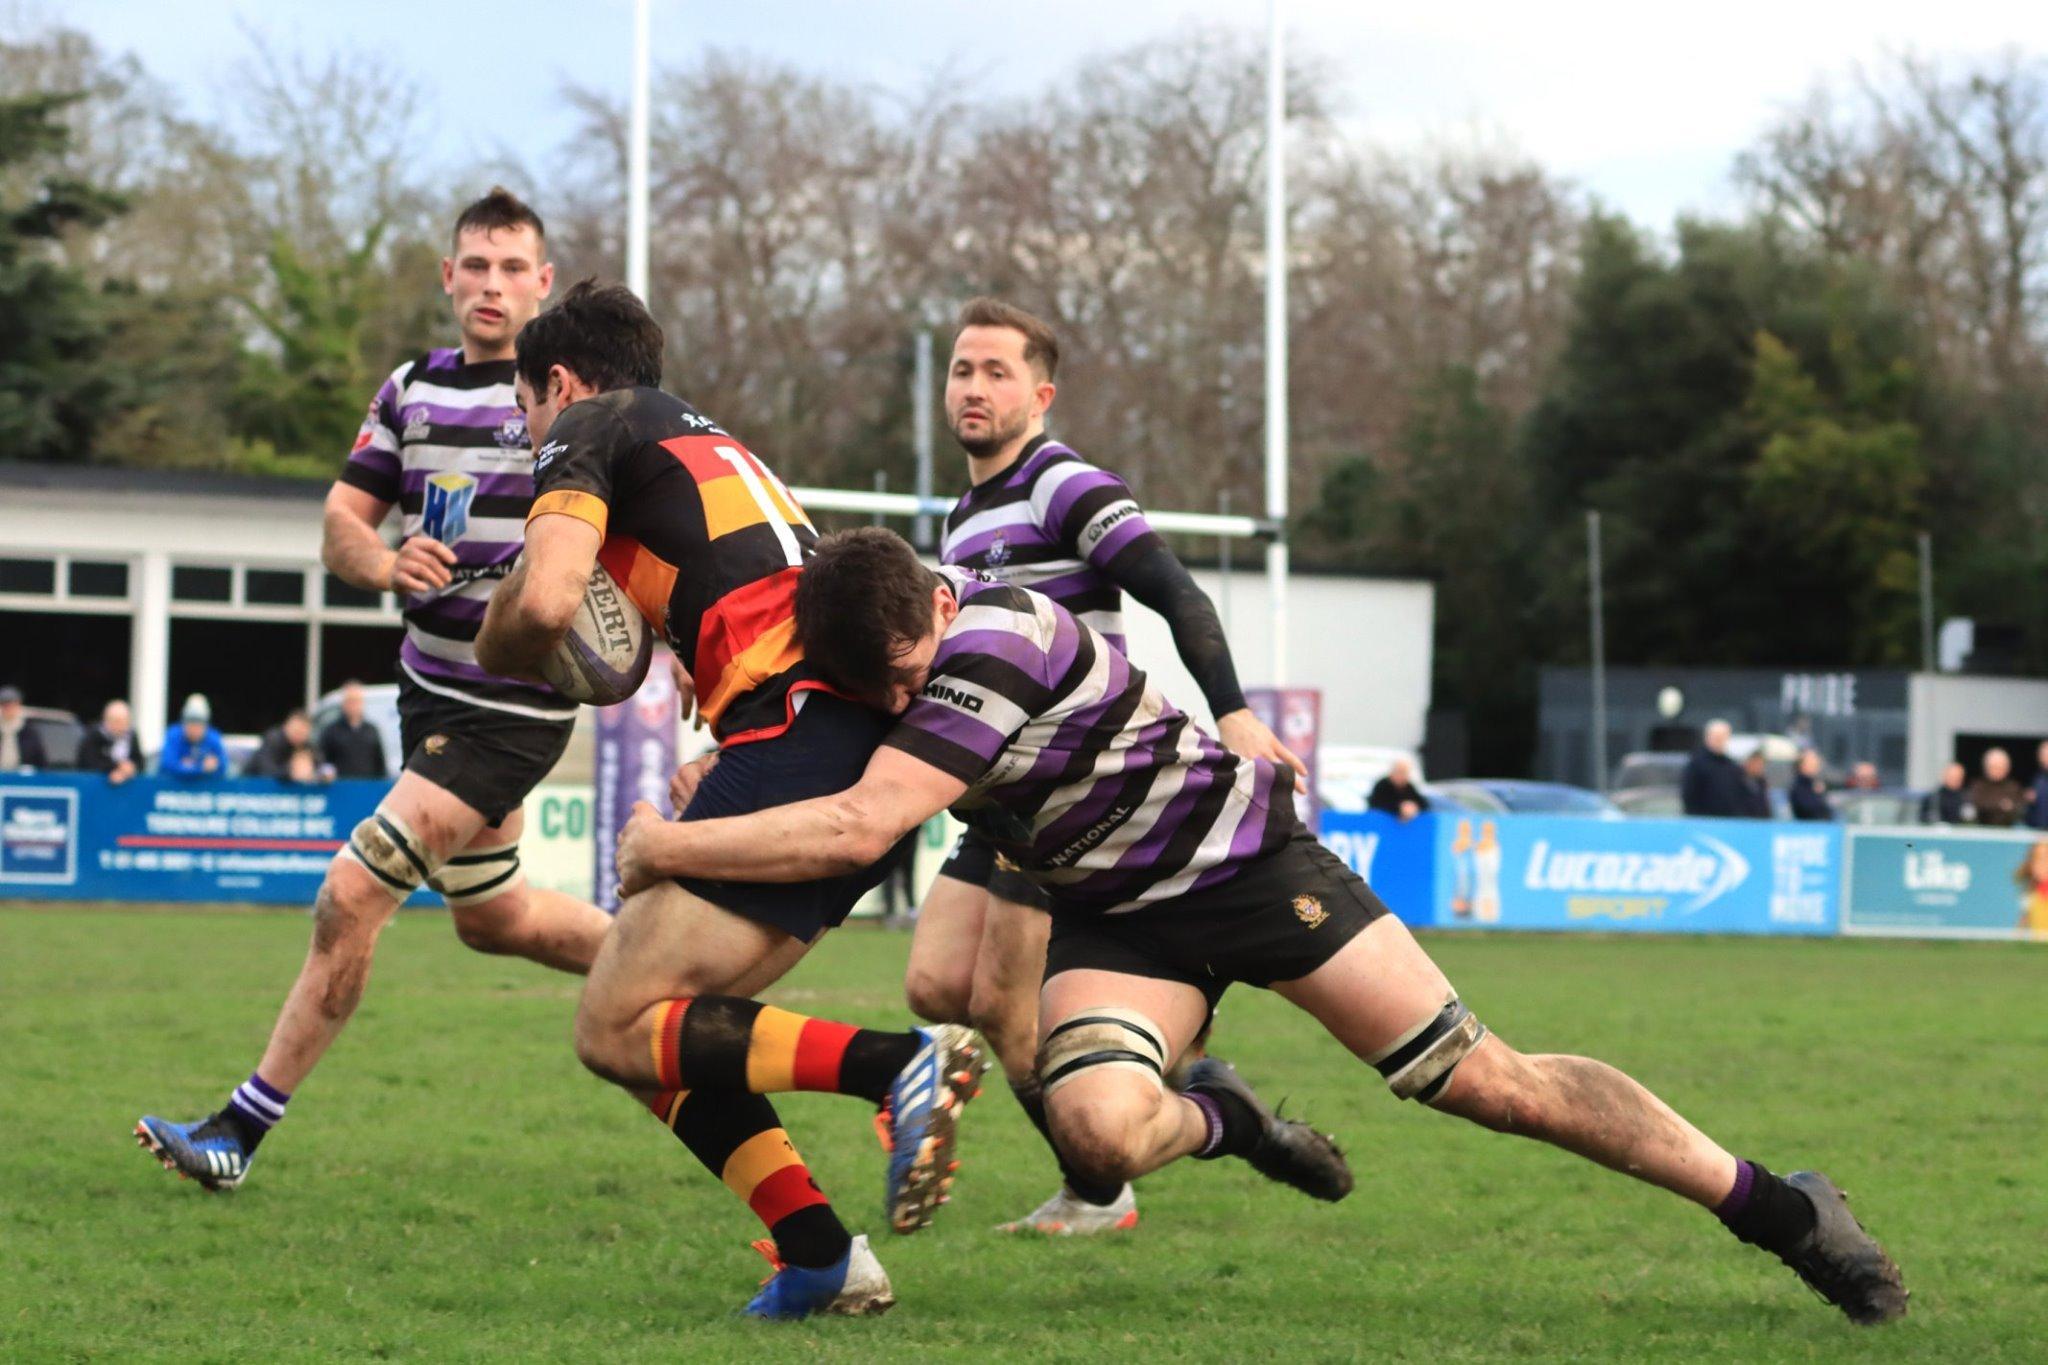 Terenure College RFC tackle Lansdowne